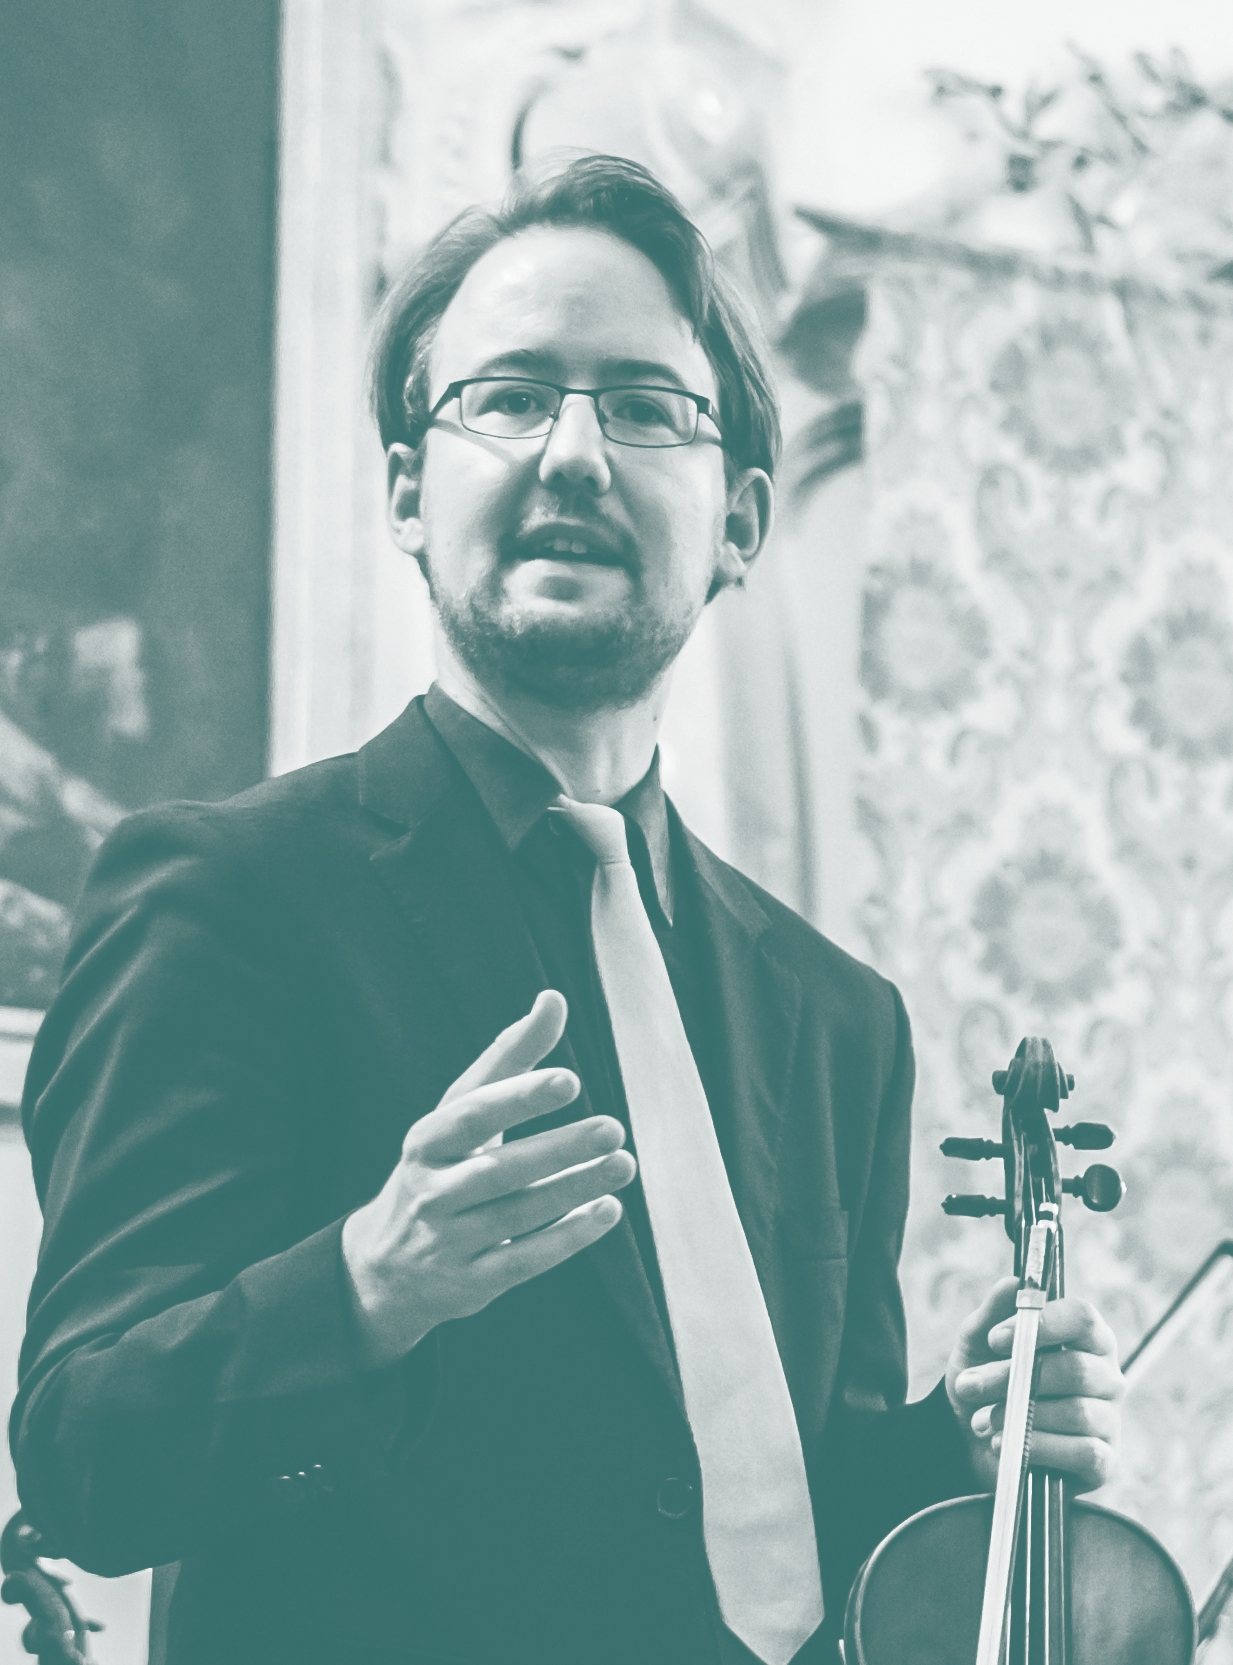 17_09_Herbstkonzert Kammerorchester Huttwil_BO-9_sw.jpg